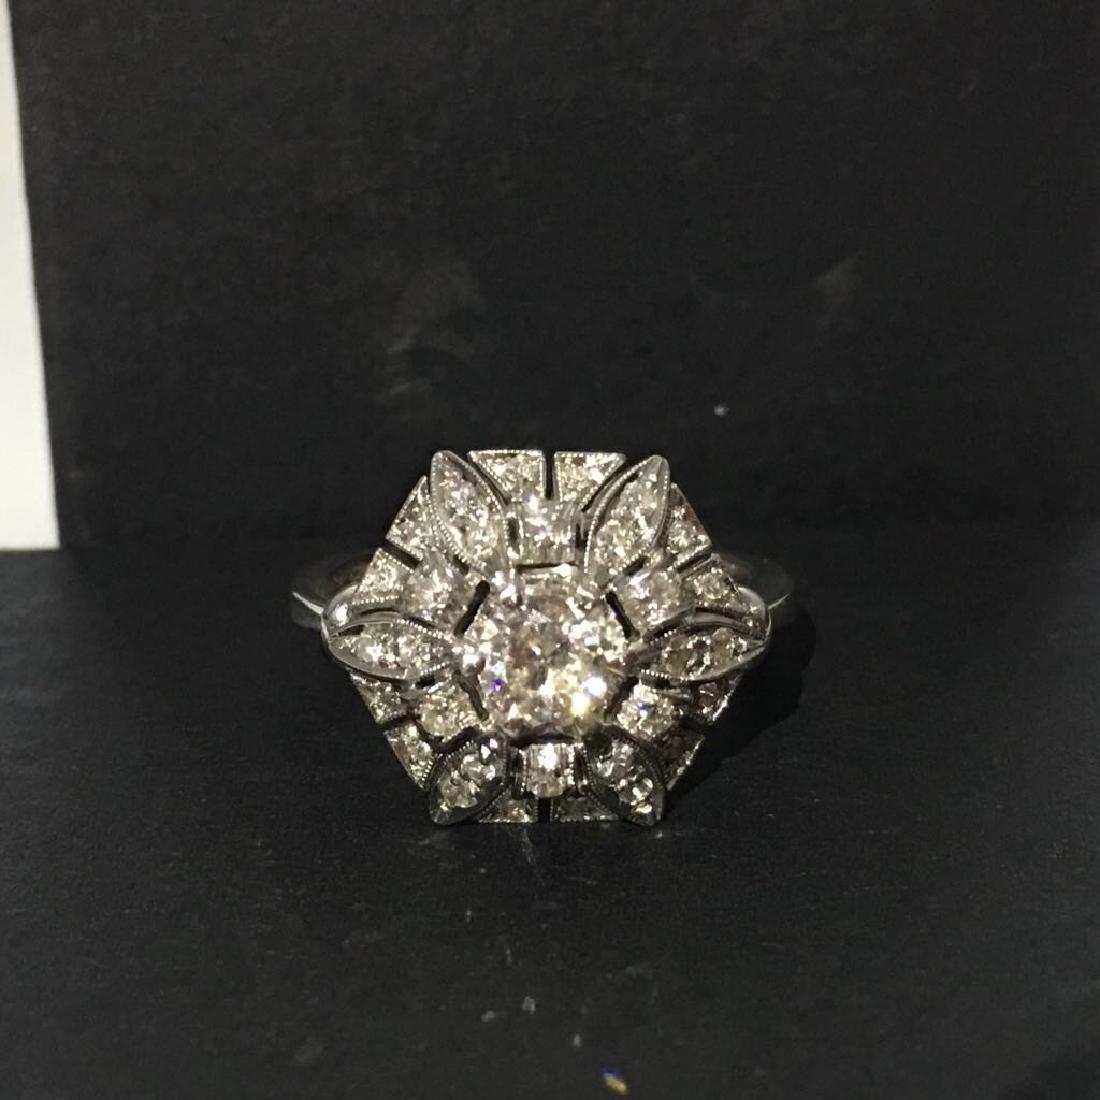 18K White Gold, 2.05 Carat VS-G Vintage Diamond Ring